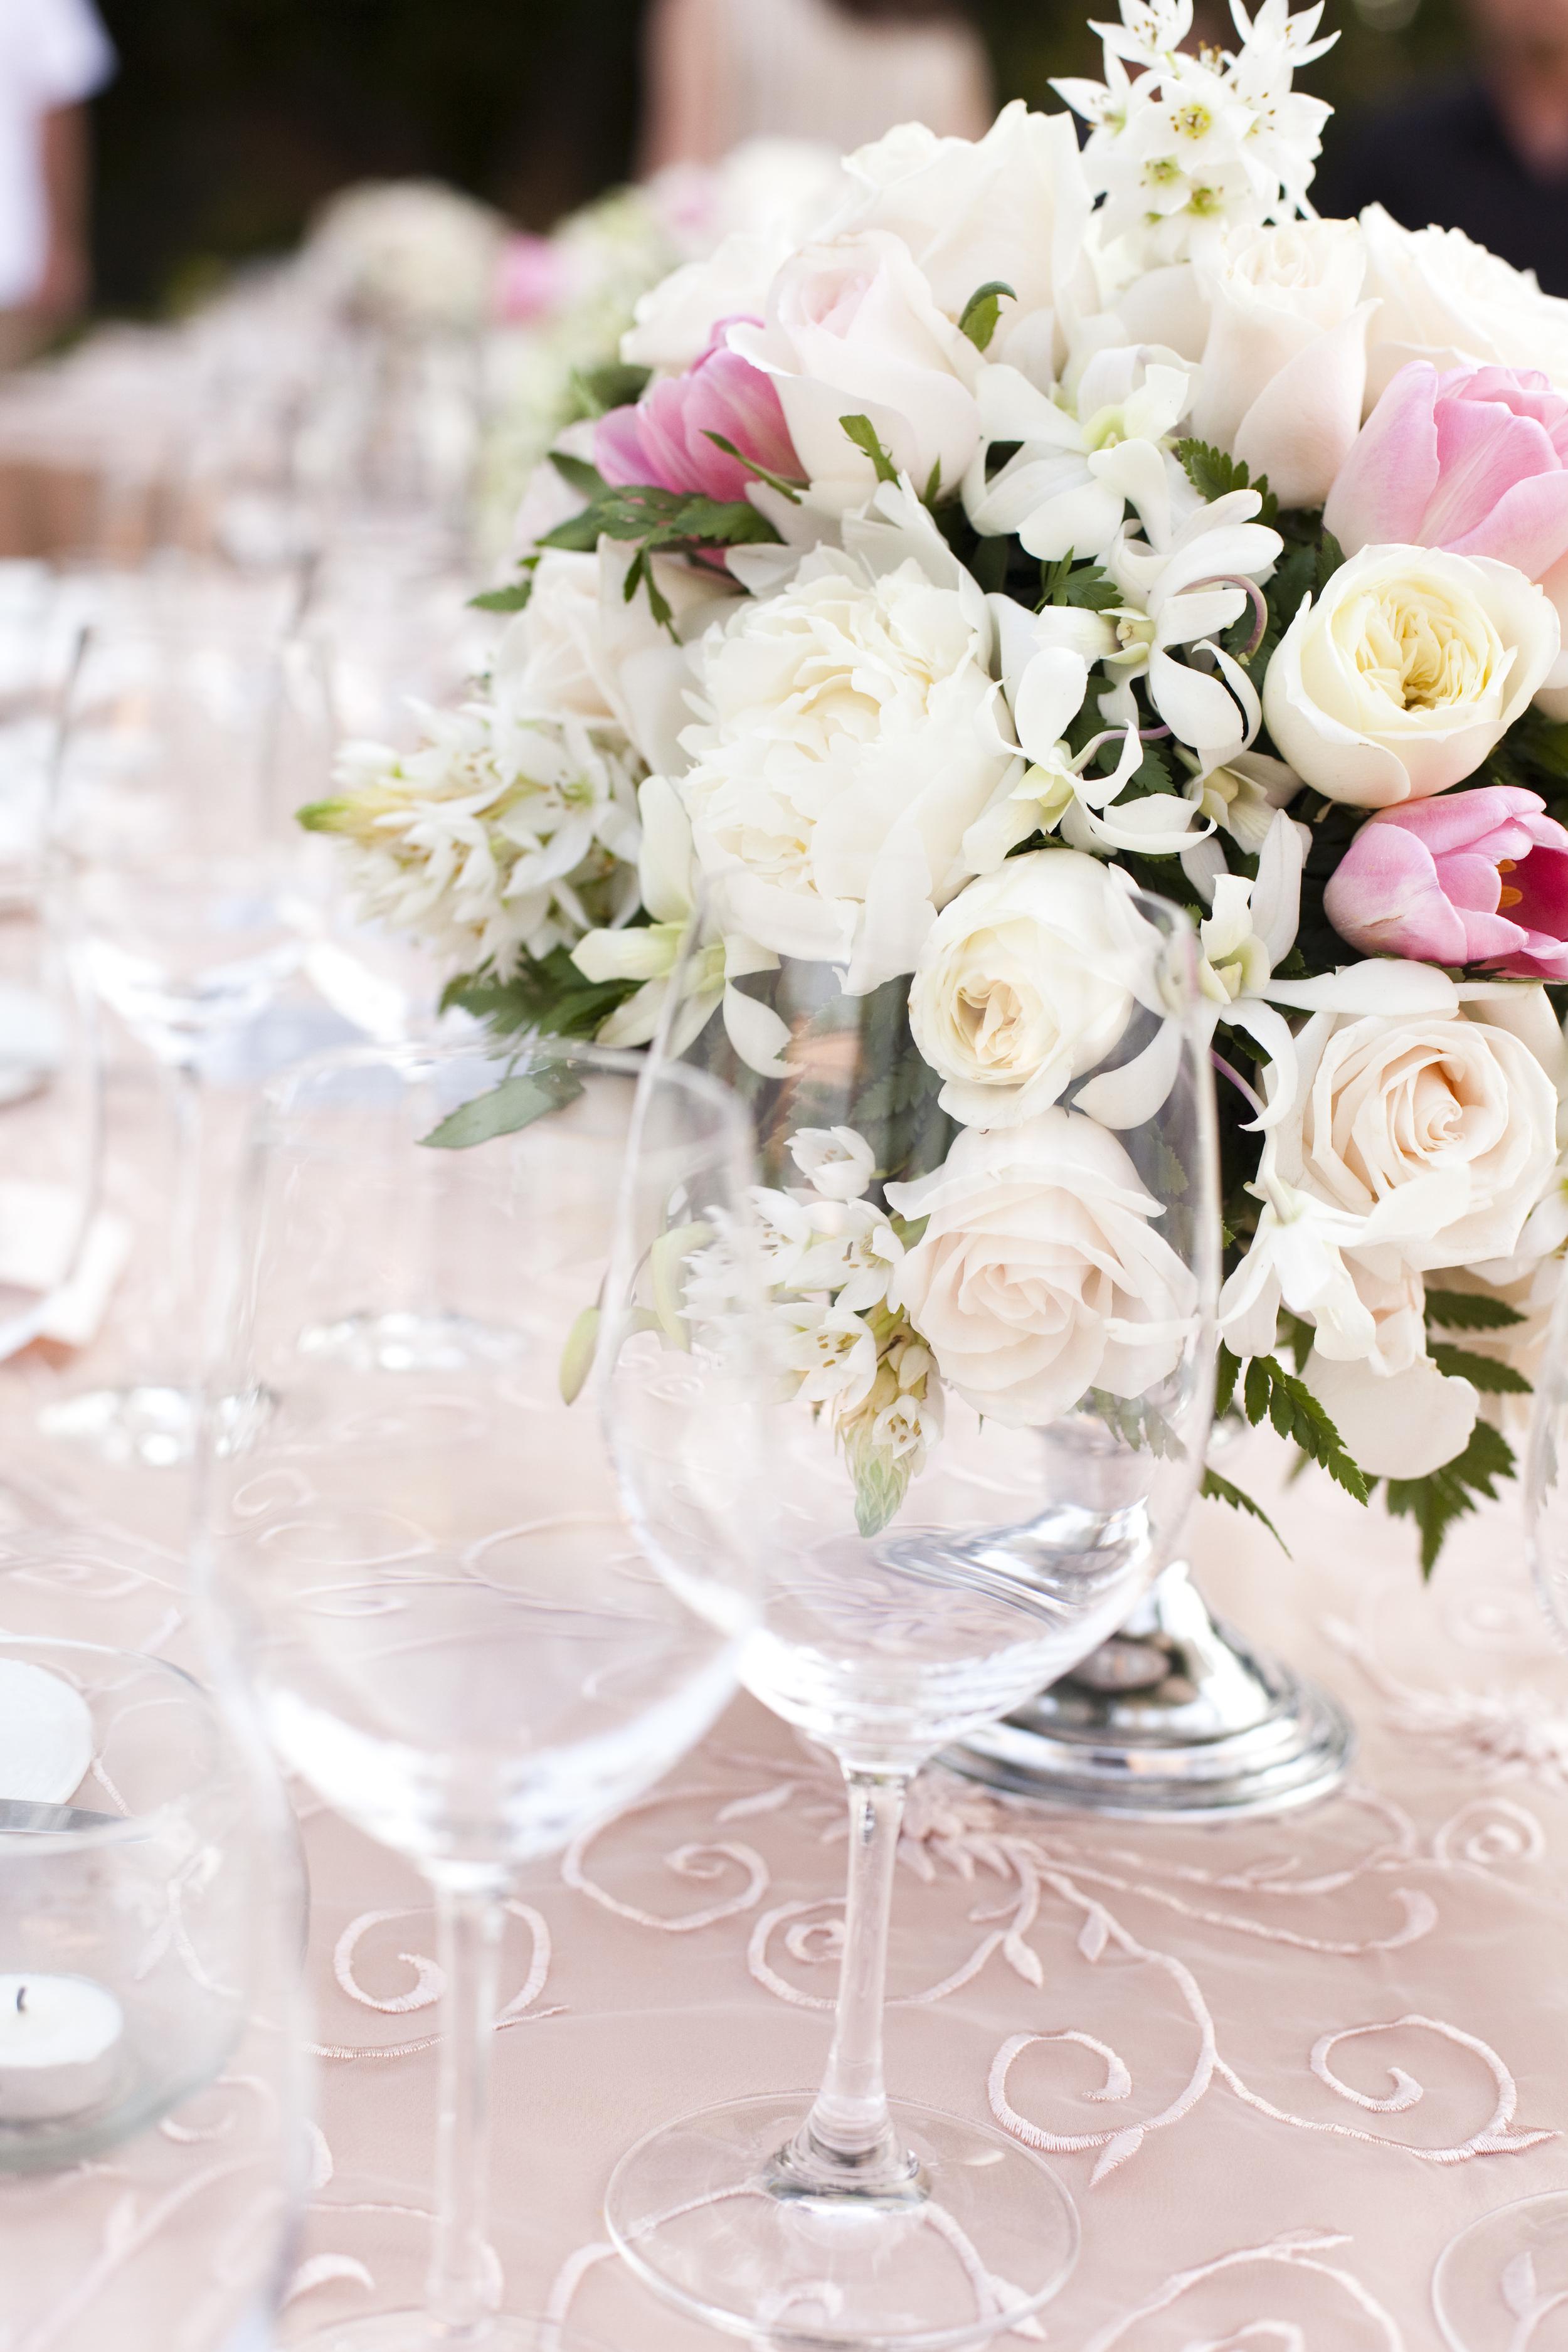 Ceci_New_York_Style_Luxury_Custom_Mexico_Wedding_CeciBride_Letterpress_NewYork_Foil_Hacienda_de_San_Antonio_43.jpg